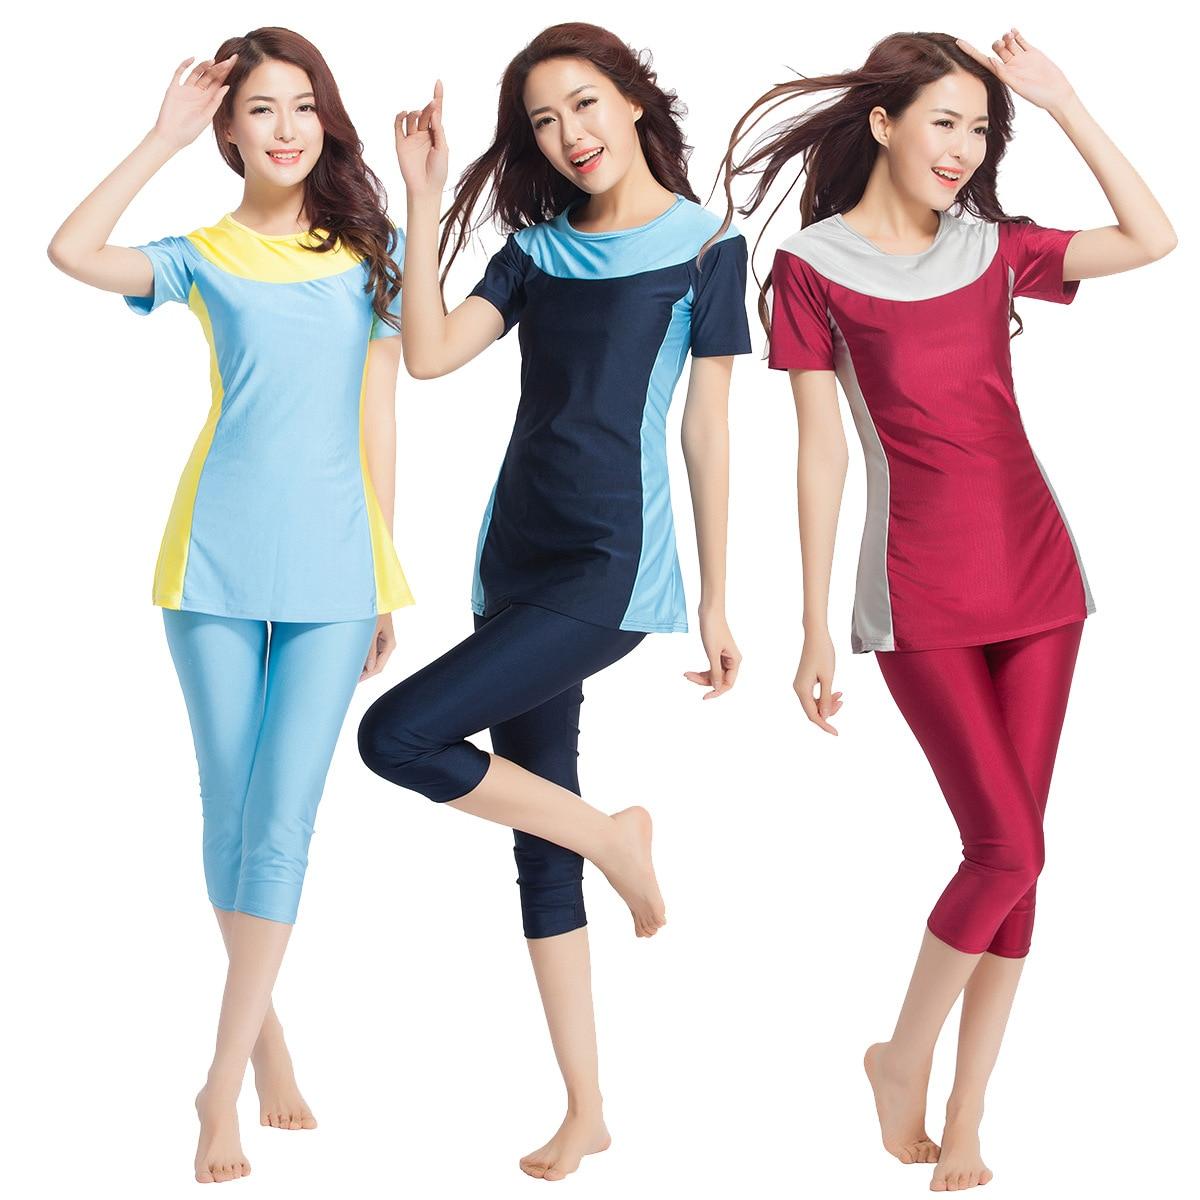 2018 Muslim swimsuit for women plus size swimwear ladies Islamic tankini short shirt+Capri pants beach swimming wear suit